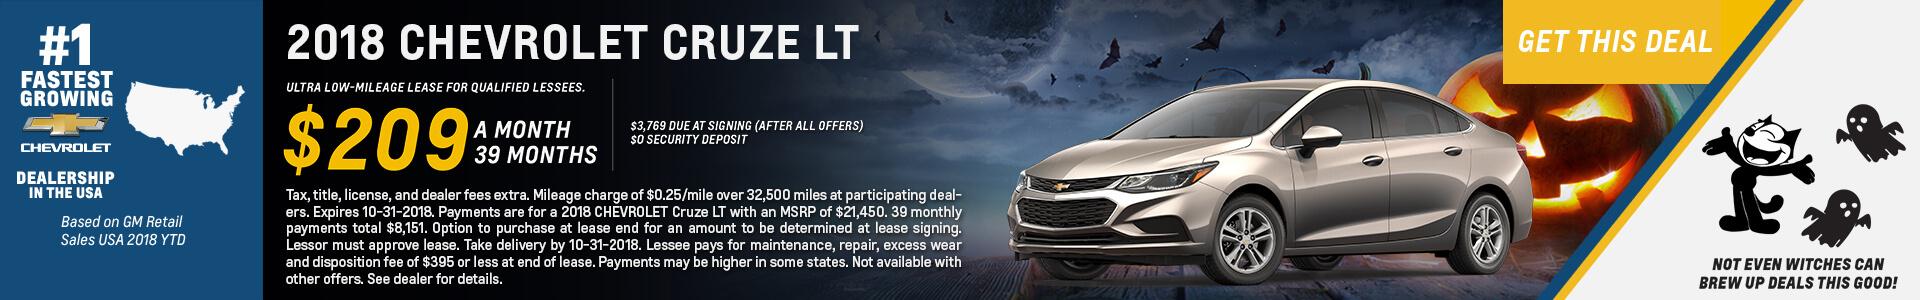 432 New Cars, Trucks, And SUVs In Stock In Los Angeles, Glendale, Pasadena  U0026 Carson, CA   Felix Chevrolet